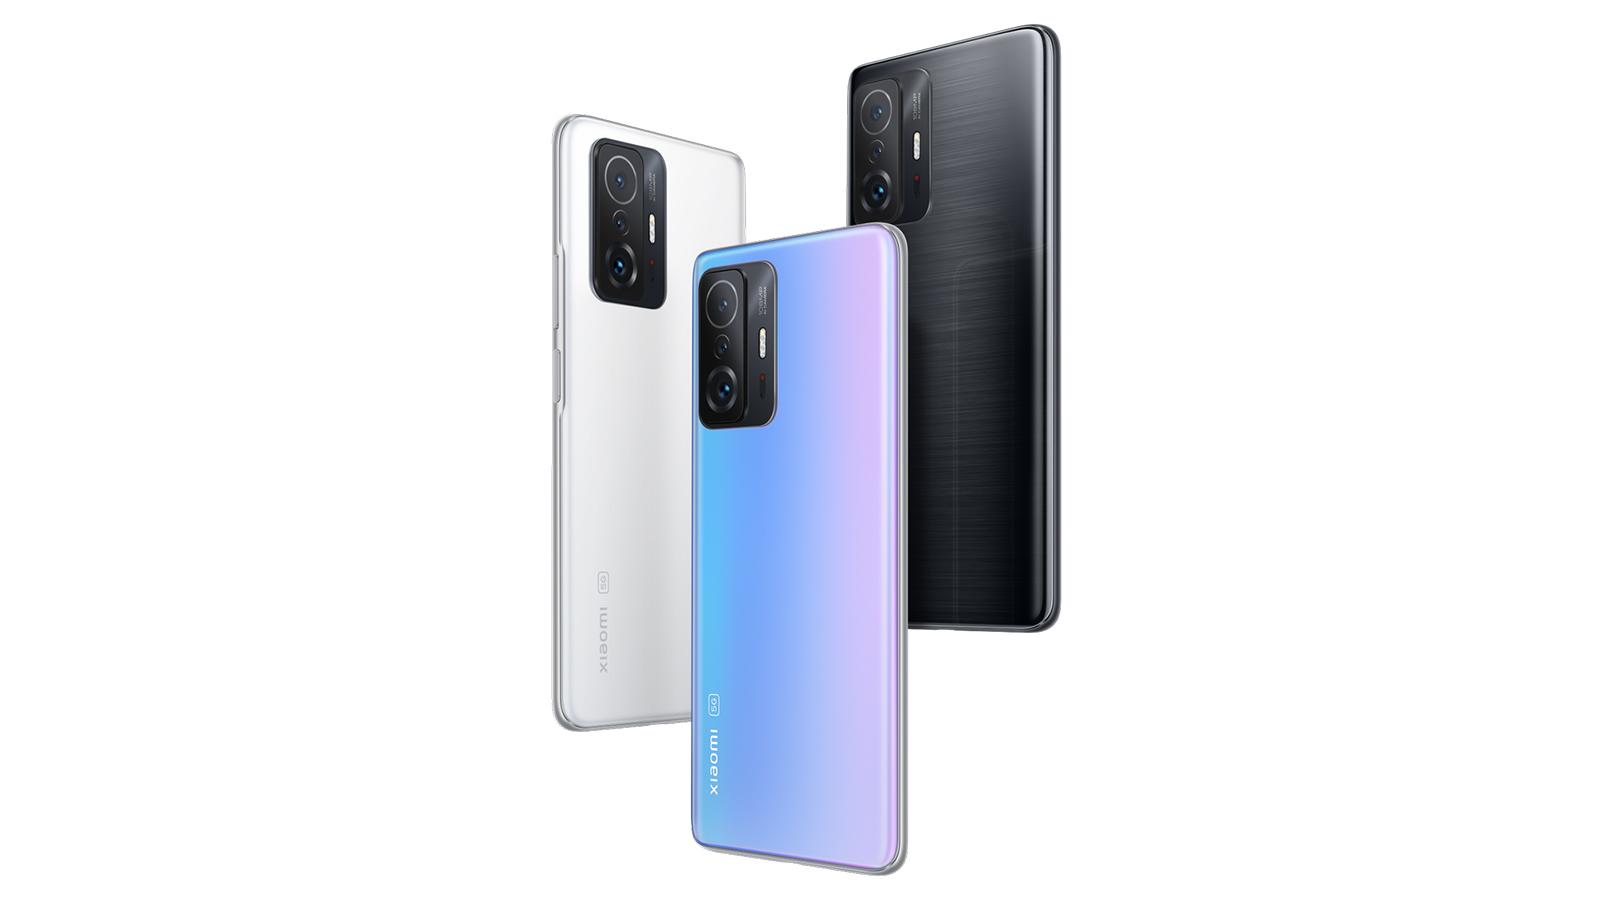 Xiaomi 11T Pro family revealed